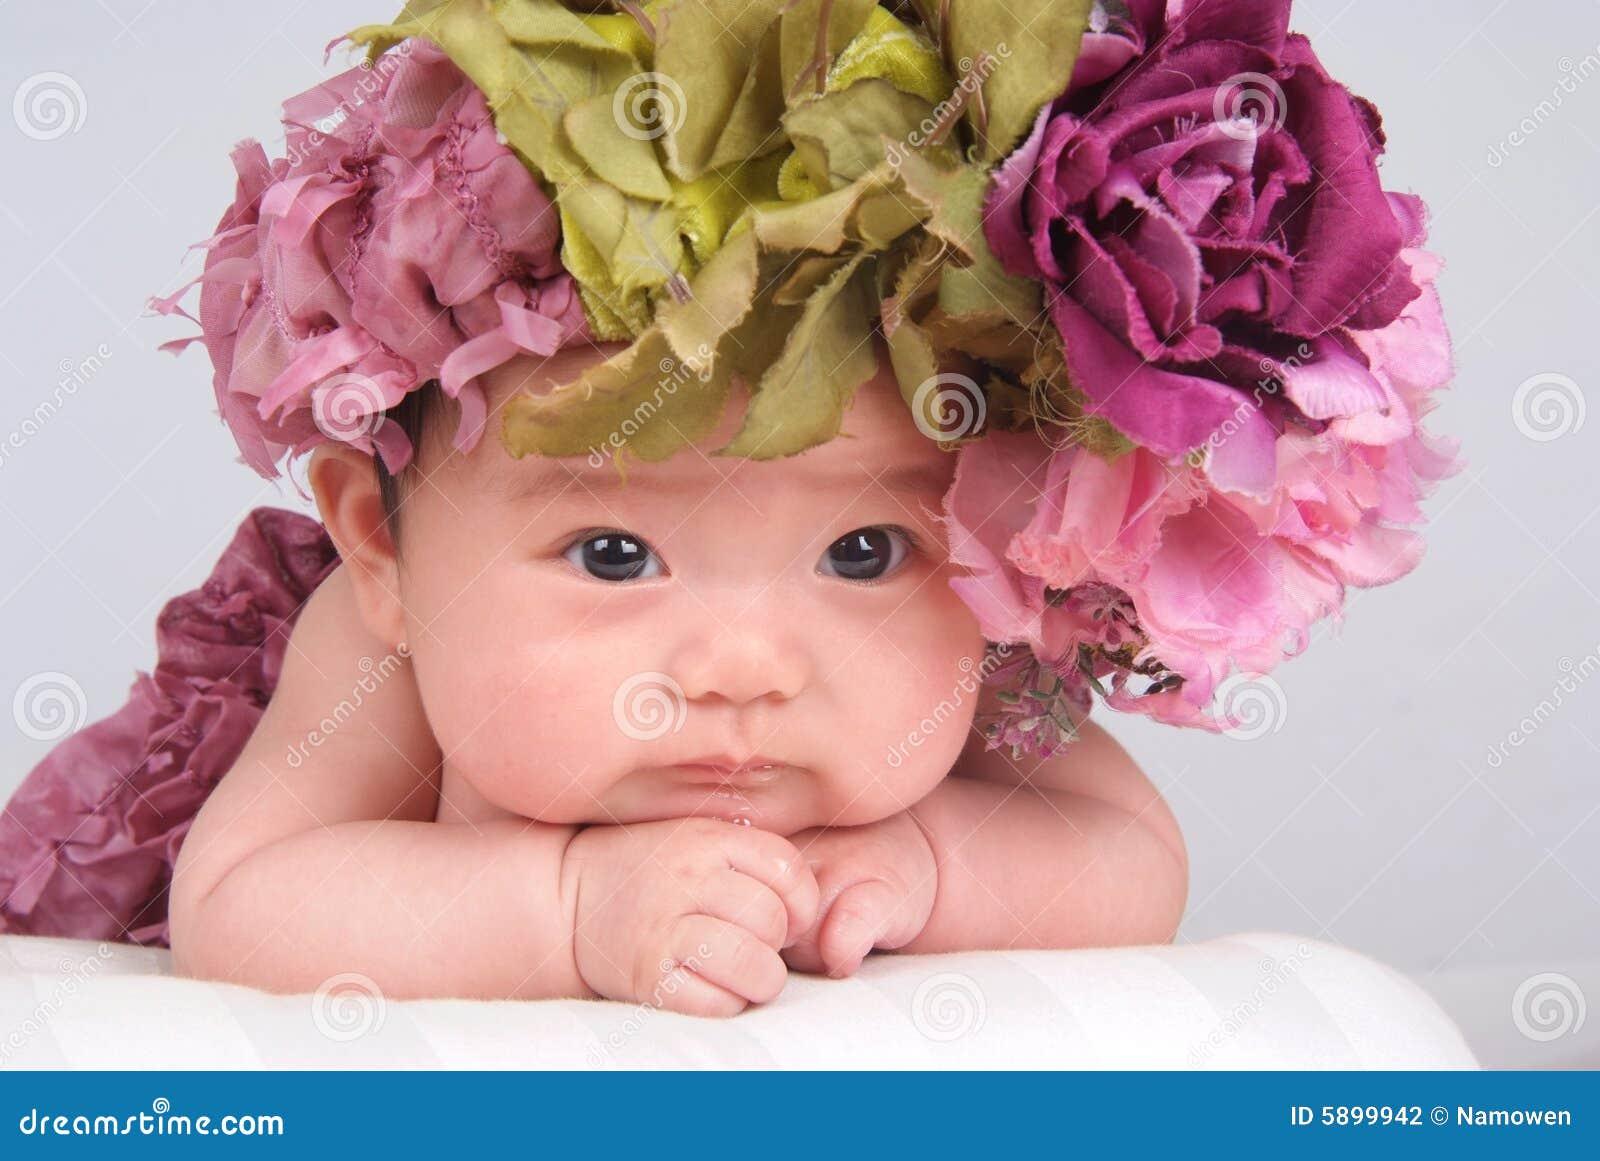 Bebê encantador